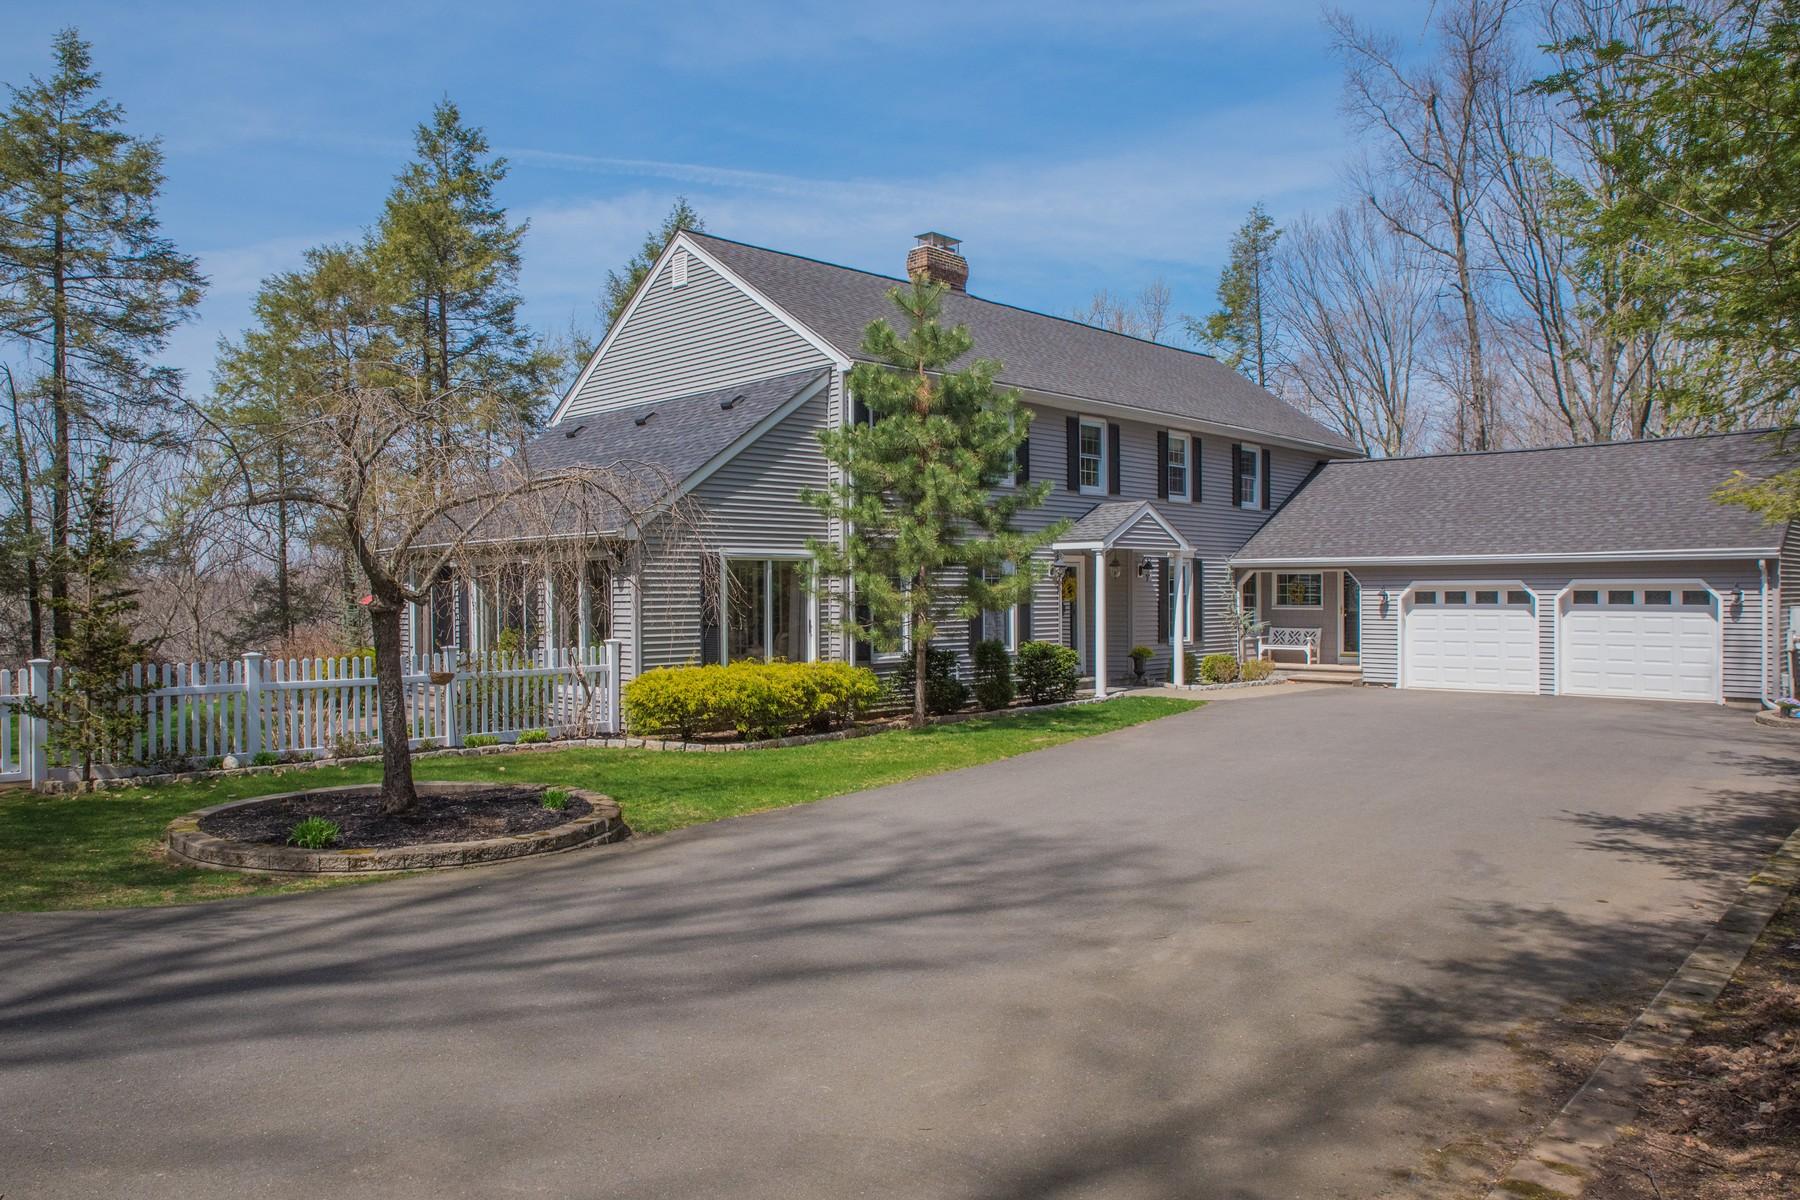 独户住宅 为 销售 在 Stunning Colonial Affords Privacy 1199 Woodruff St Southington, 康涅狄格州, 06489 美国